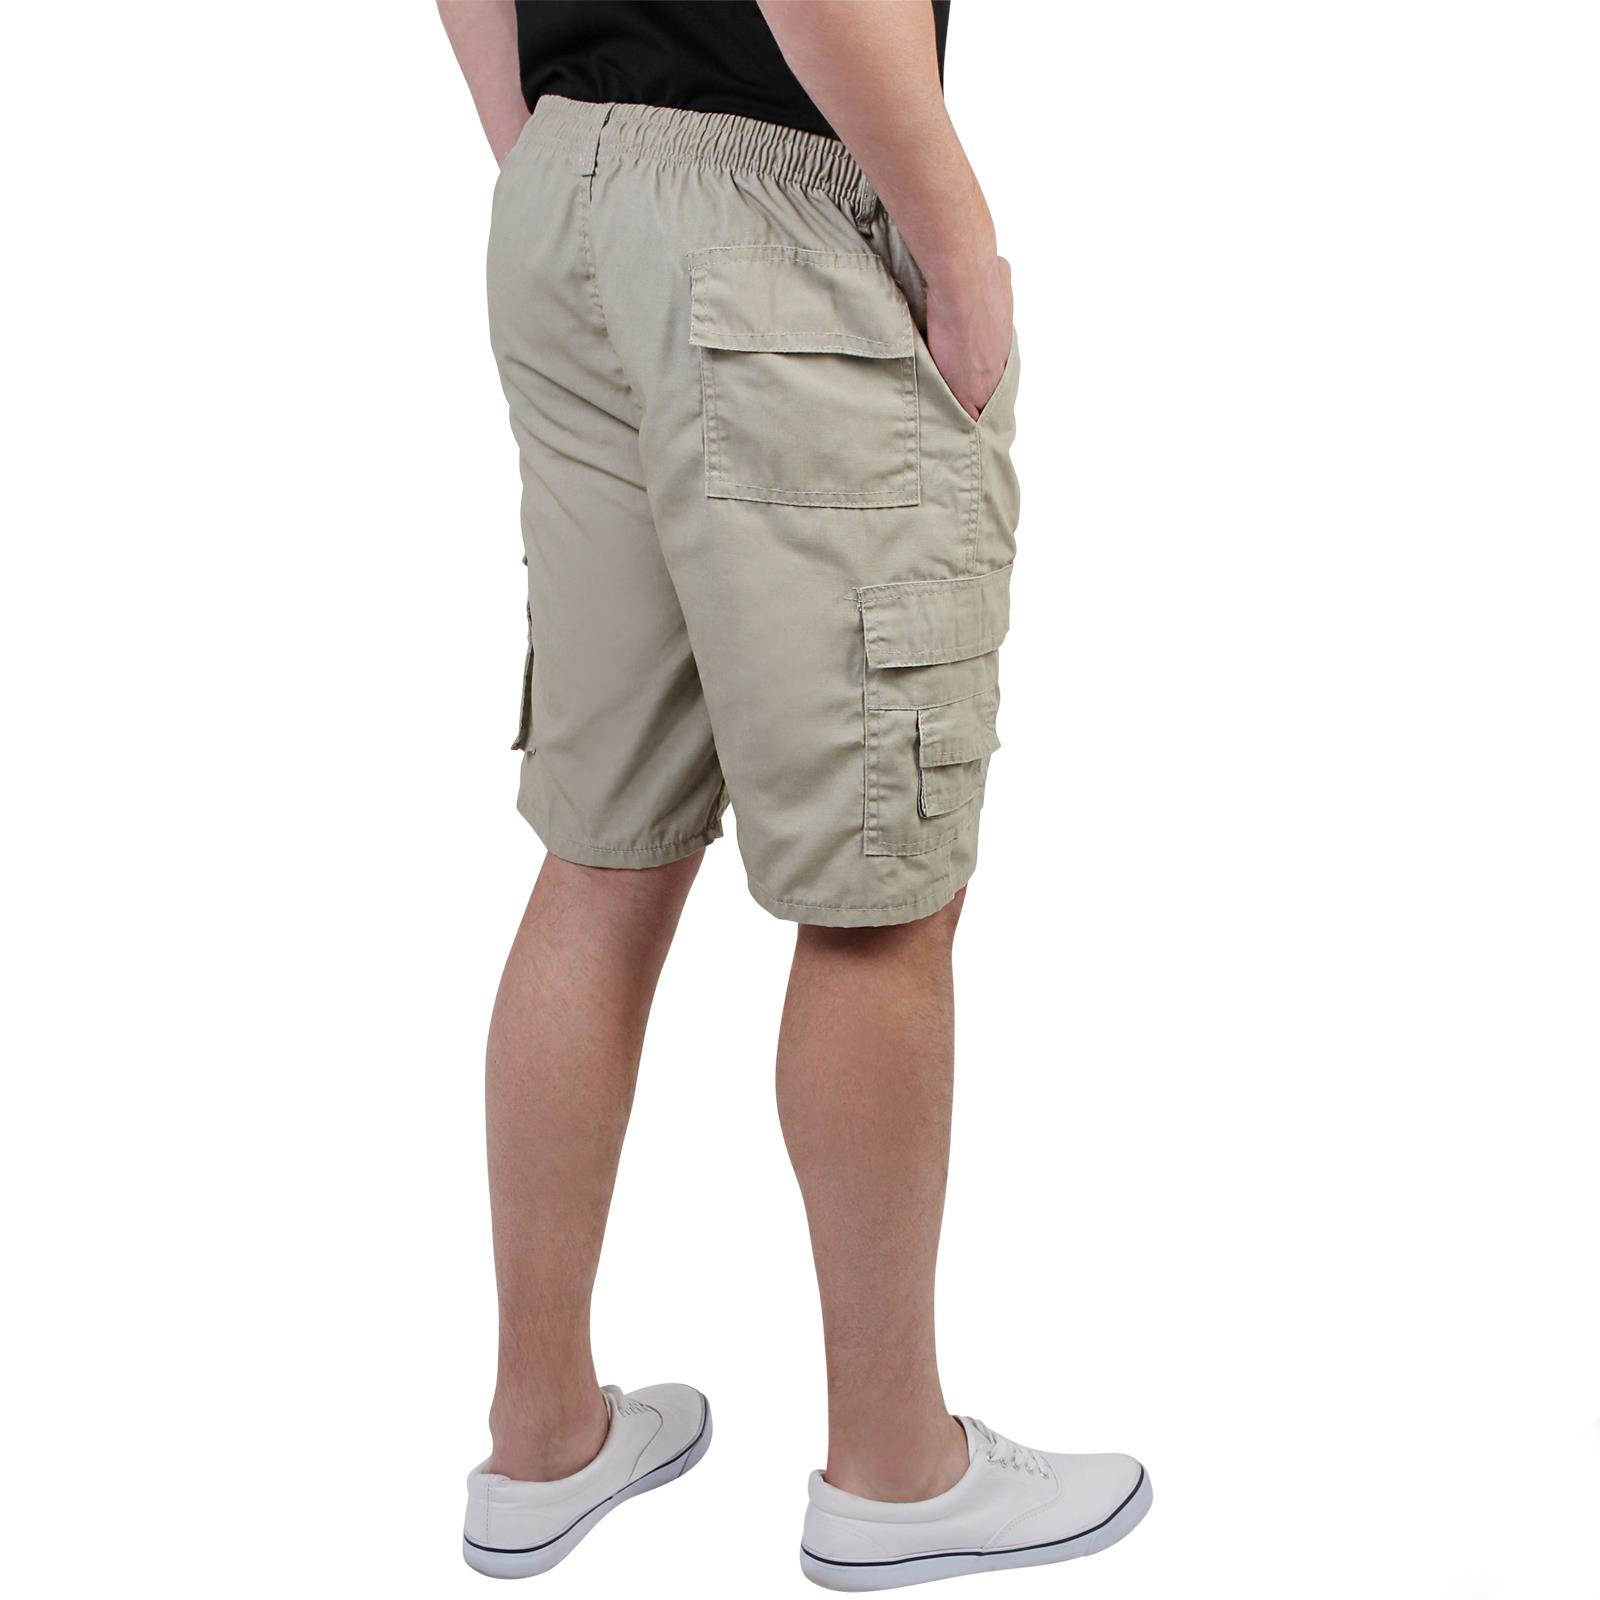 Mens-Cotton-Cargo-Shorts-Plain-Basic-Casual-Work-Chinos-Combat-Pants-Regular thumbnail 24